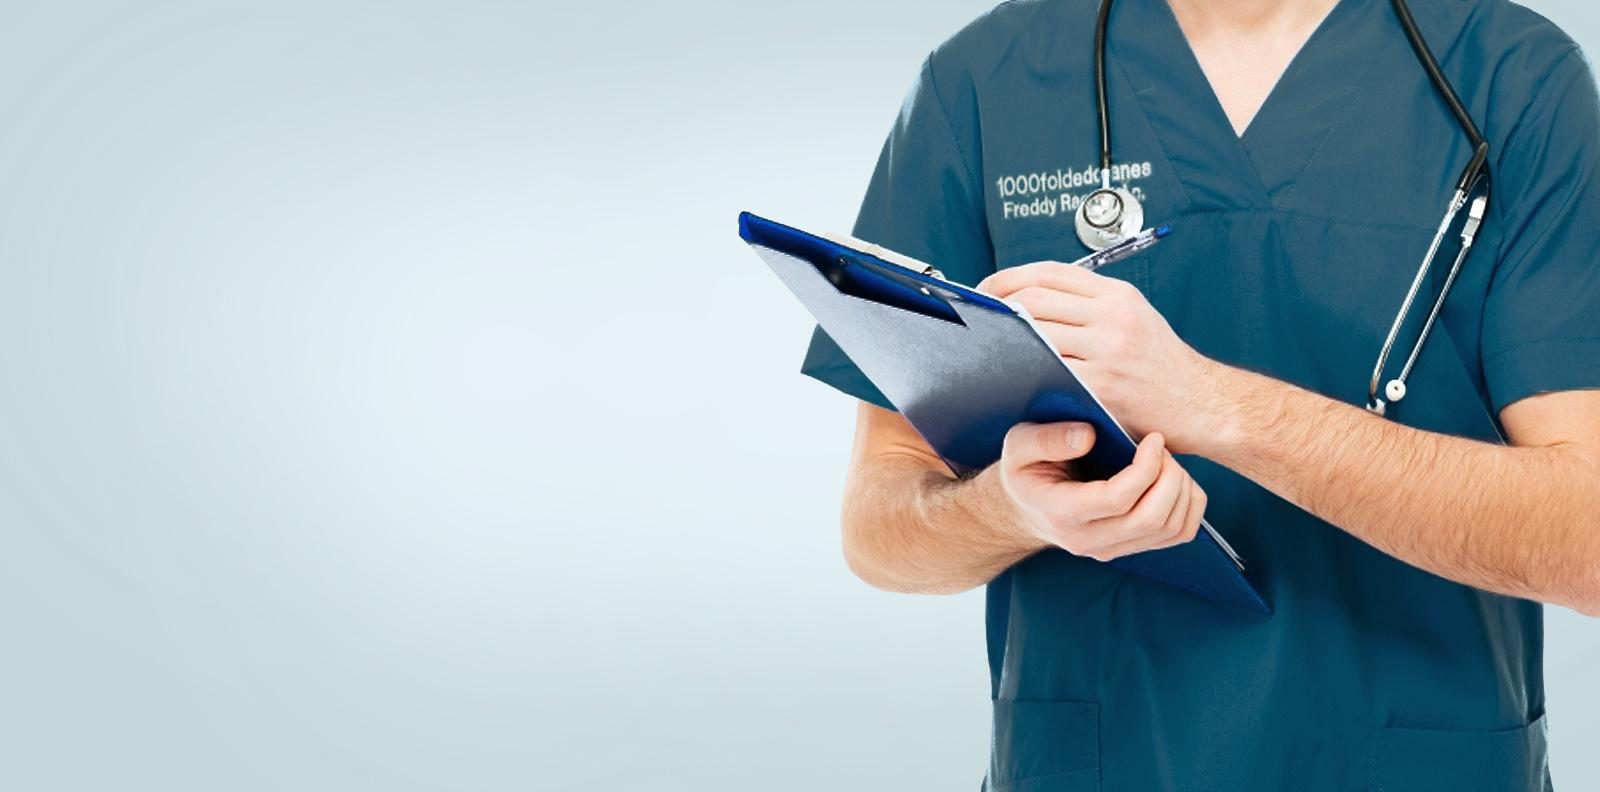 Dr. Fred Ragsdale - Preventive Care